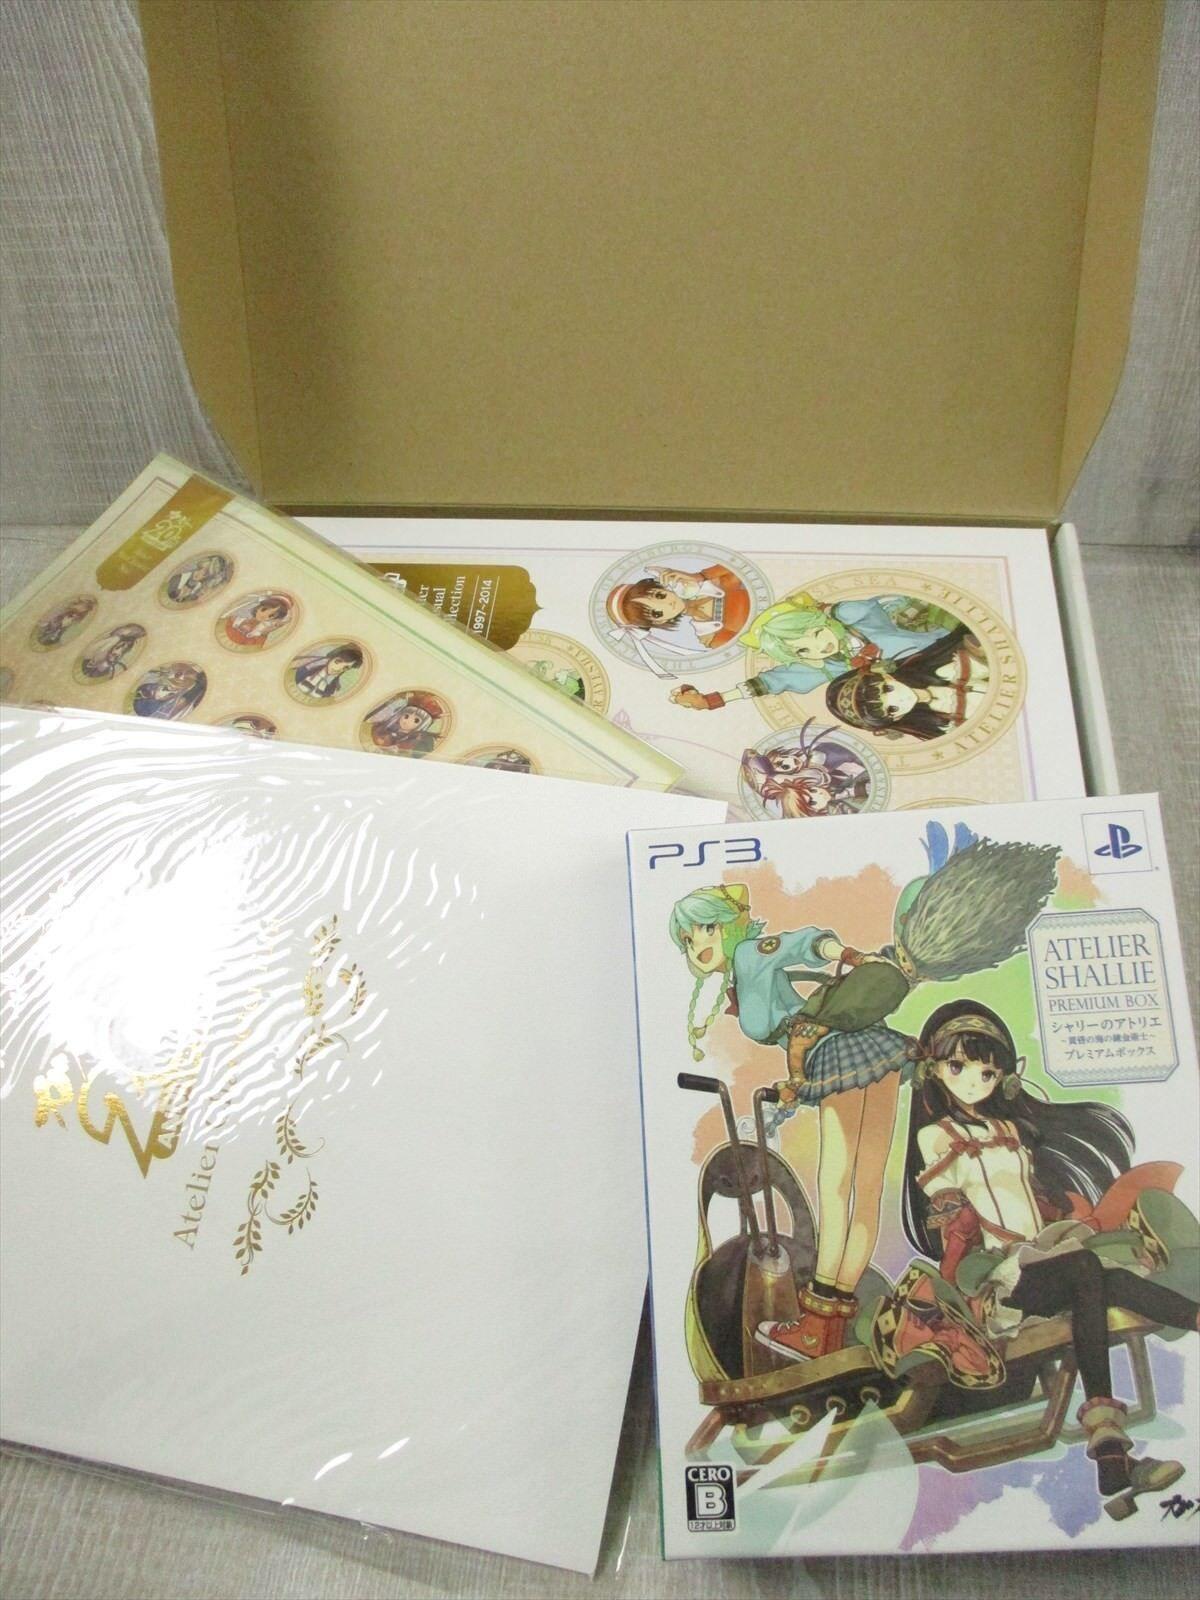 ATELIER SHALLIE Gust 20th Anniv. MEMORIAL BOX Complete Art Set Book CD PS3 etc *